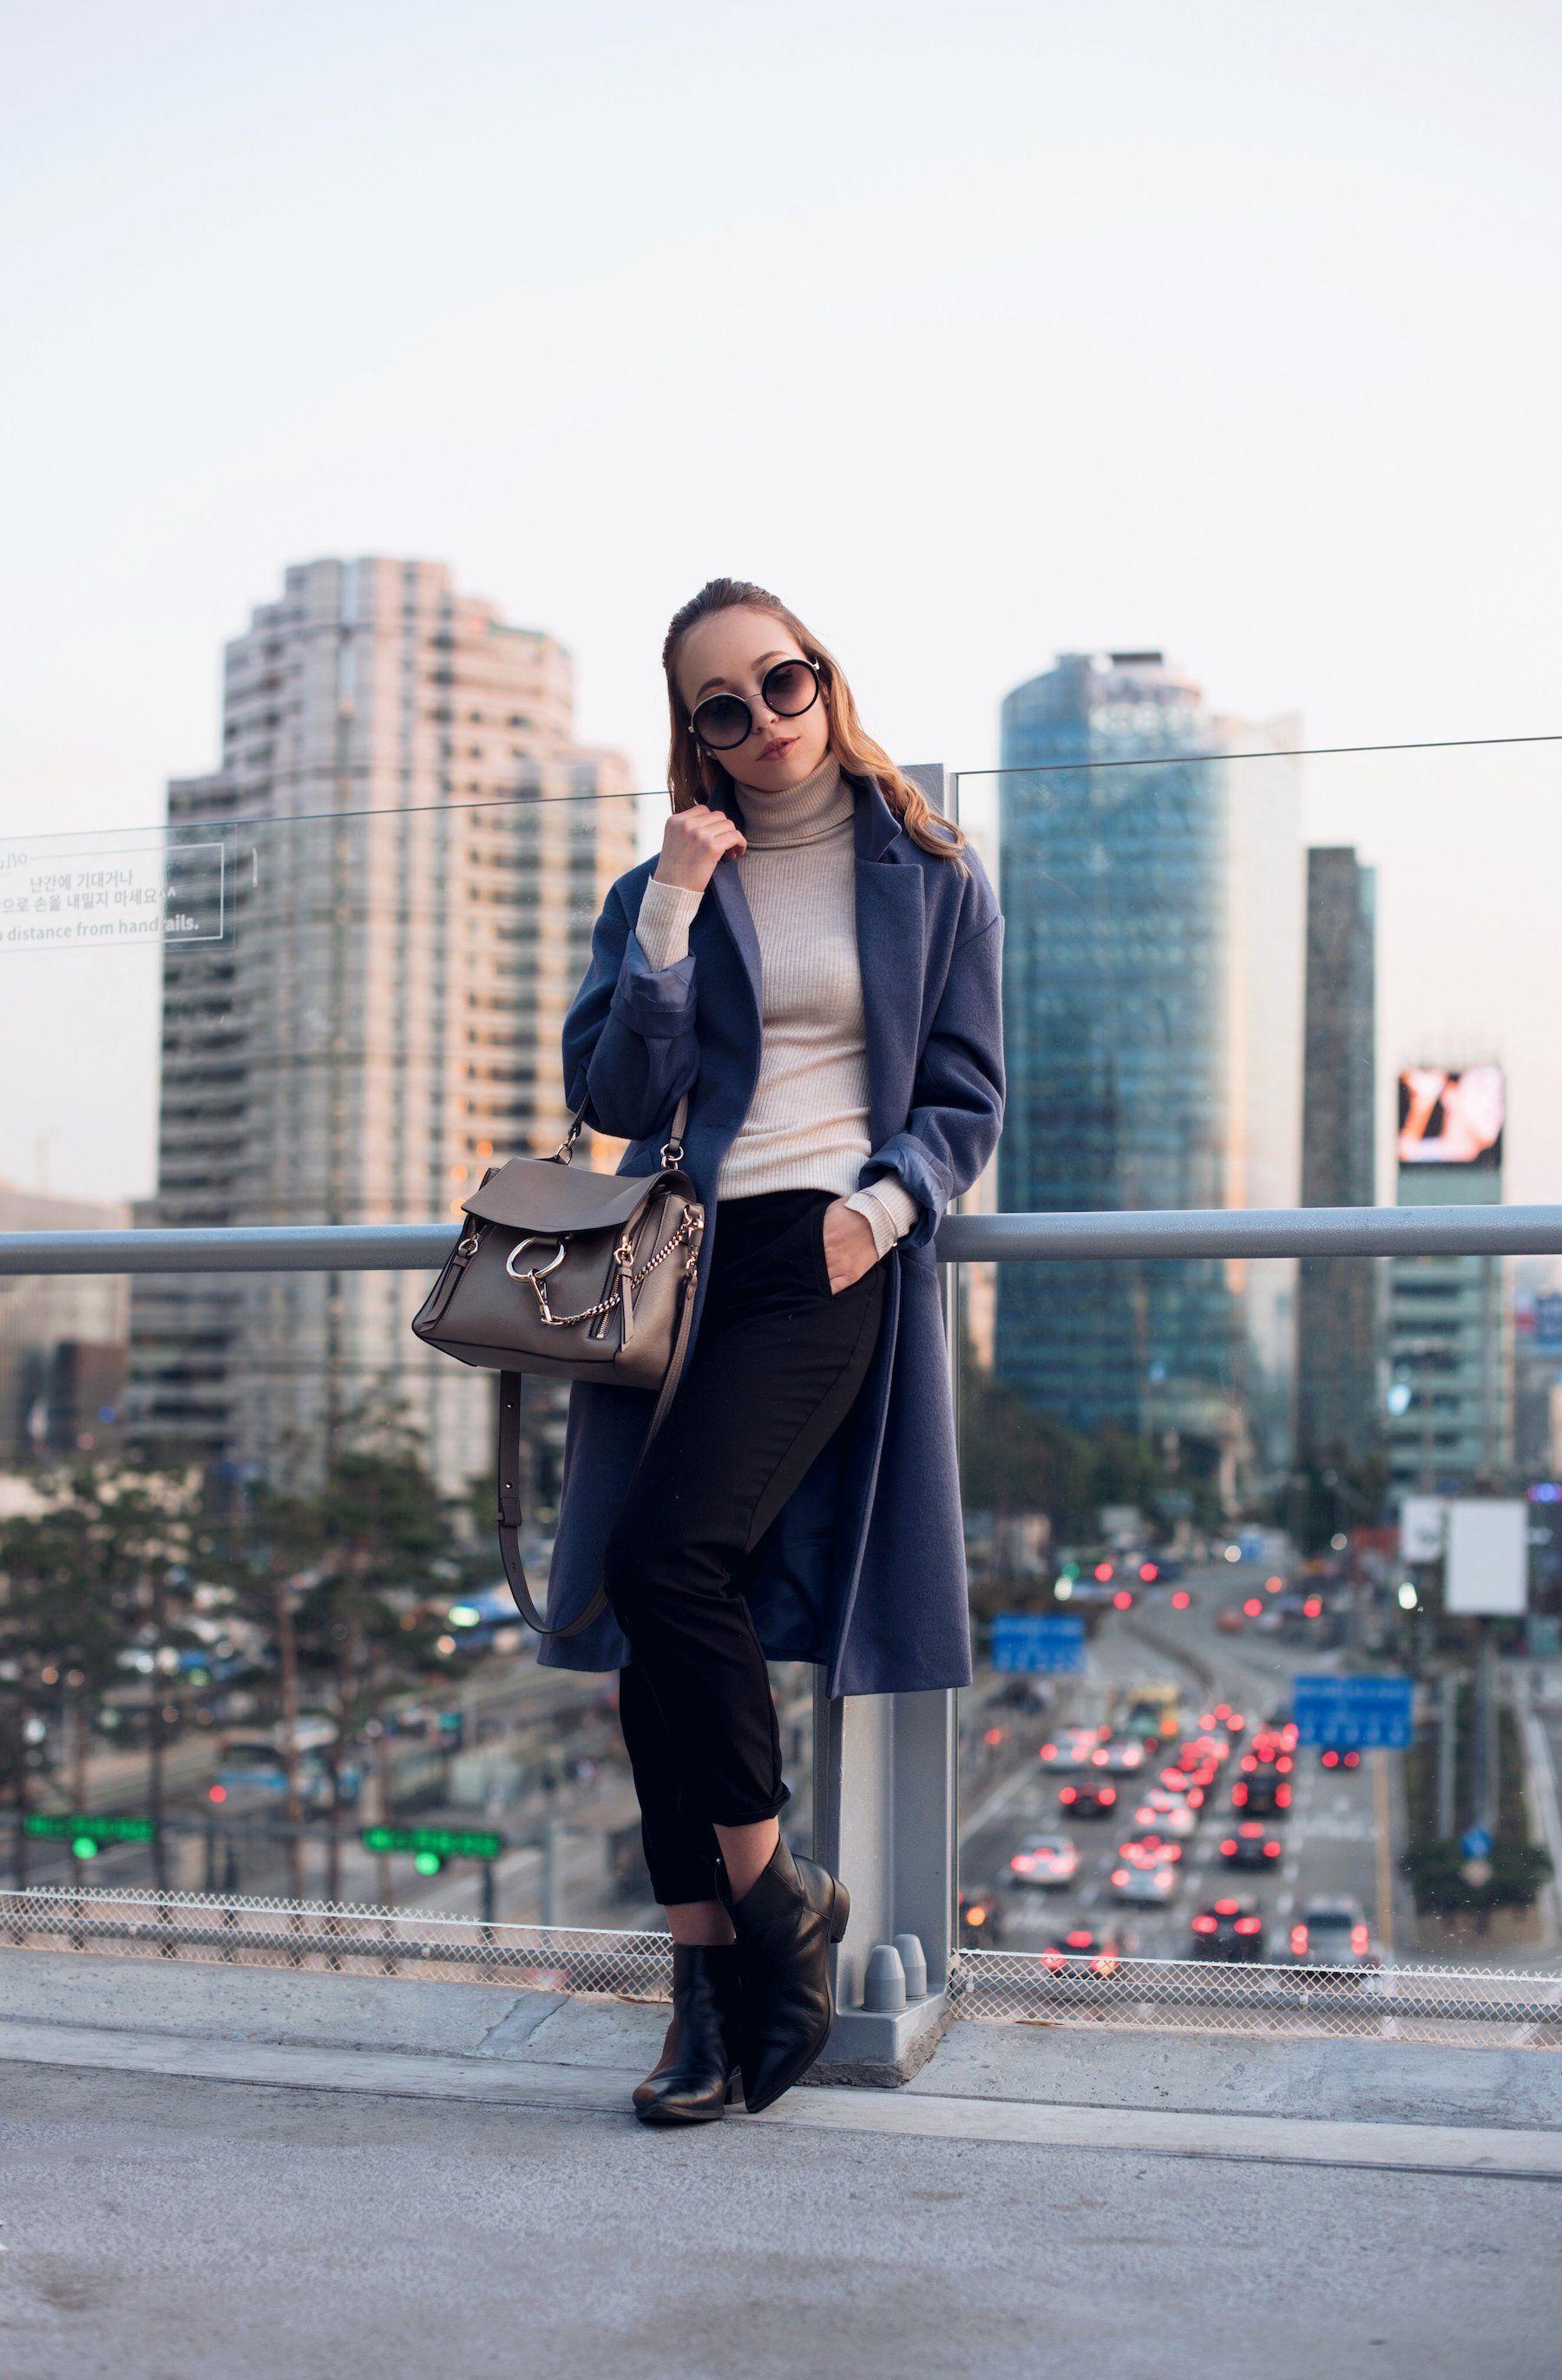 Trendfarbe Blau: So kombinierst du den blauen Mantel